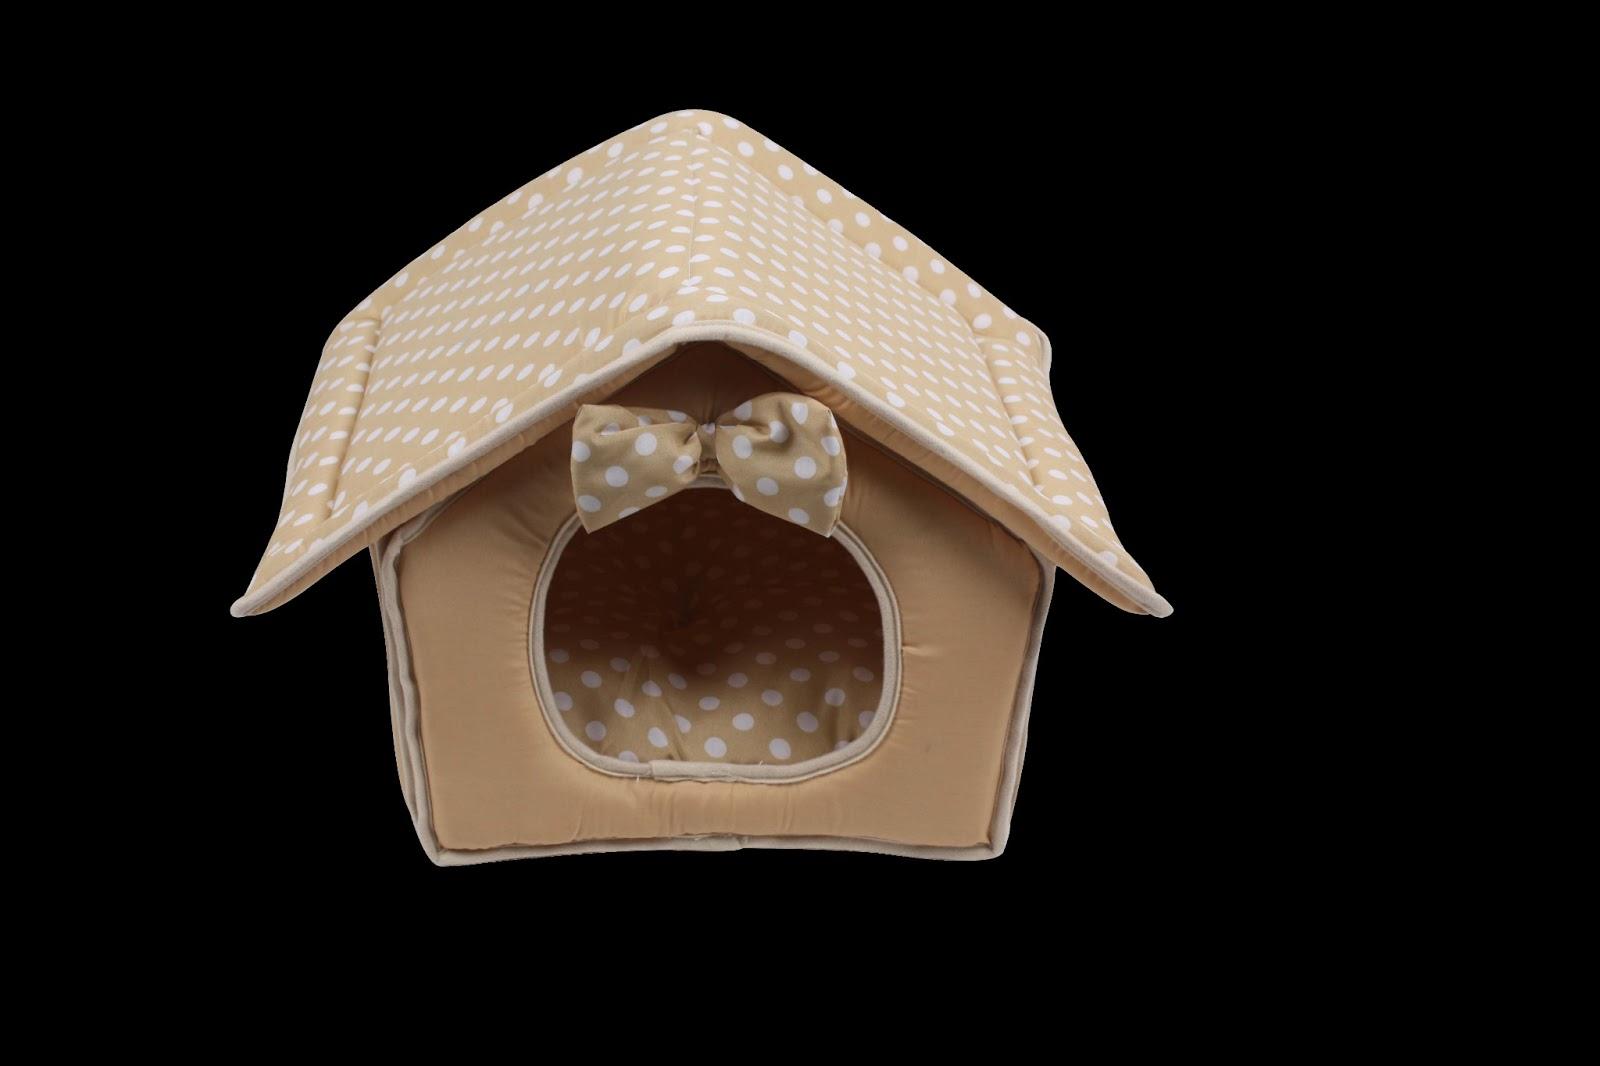 hundezubeh r f r kleine und gro e hunde fashion and lifestyle for dogs hundebetten und. Black Bedroom Furniture Sets. Home Design Ideas